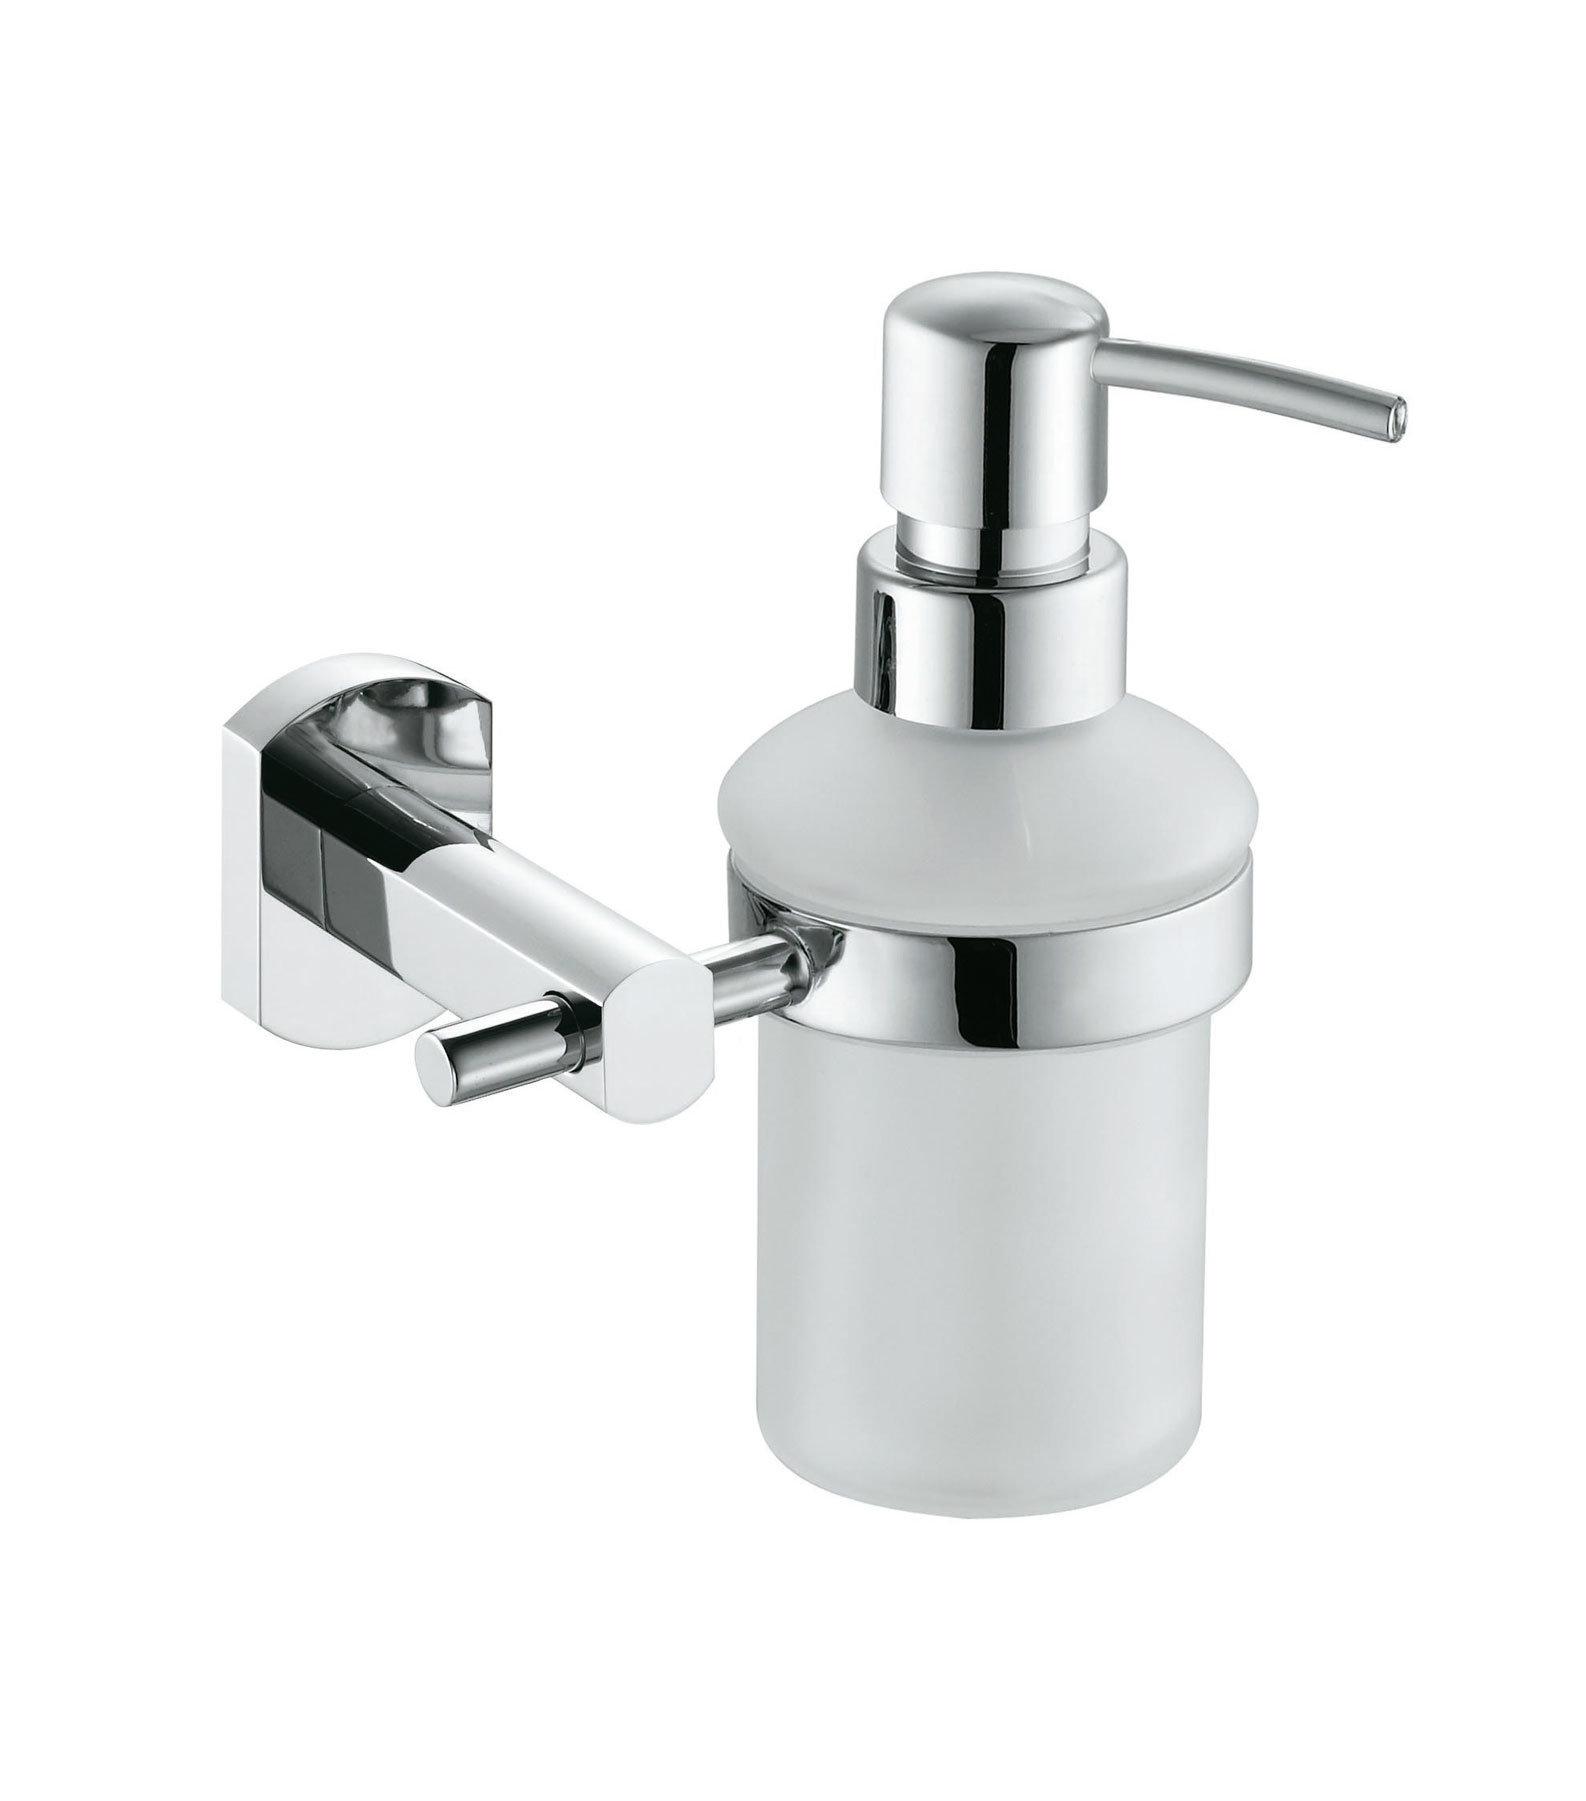 China Bathroom Accessories - Soap Dispenser - China Single Towel Bar ...